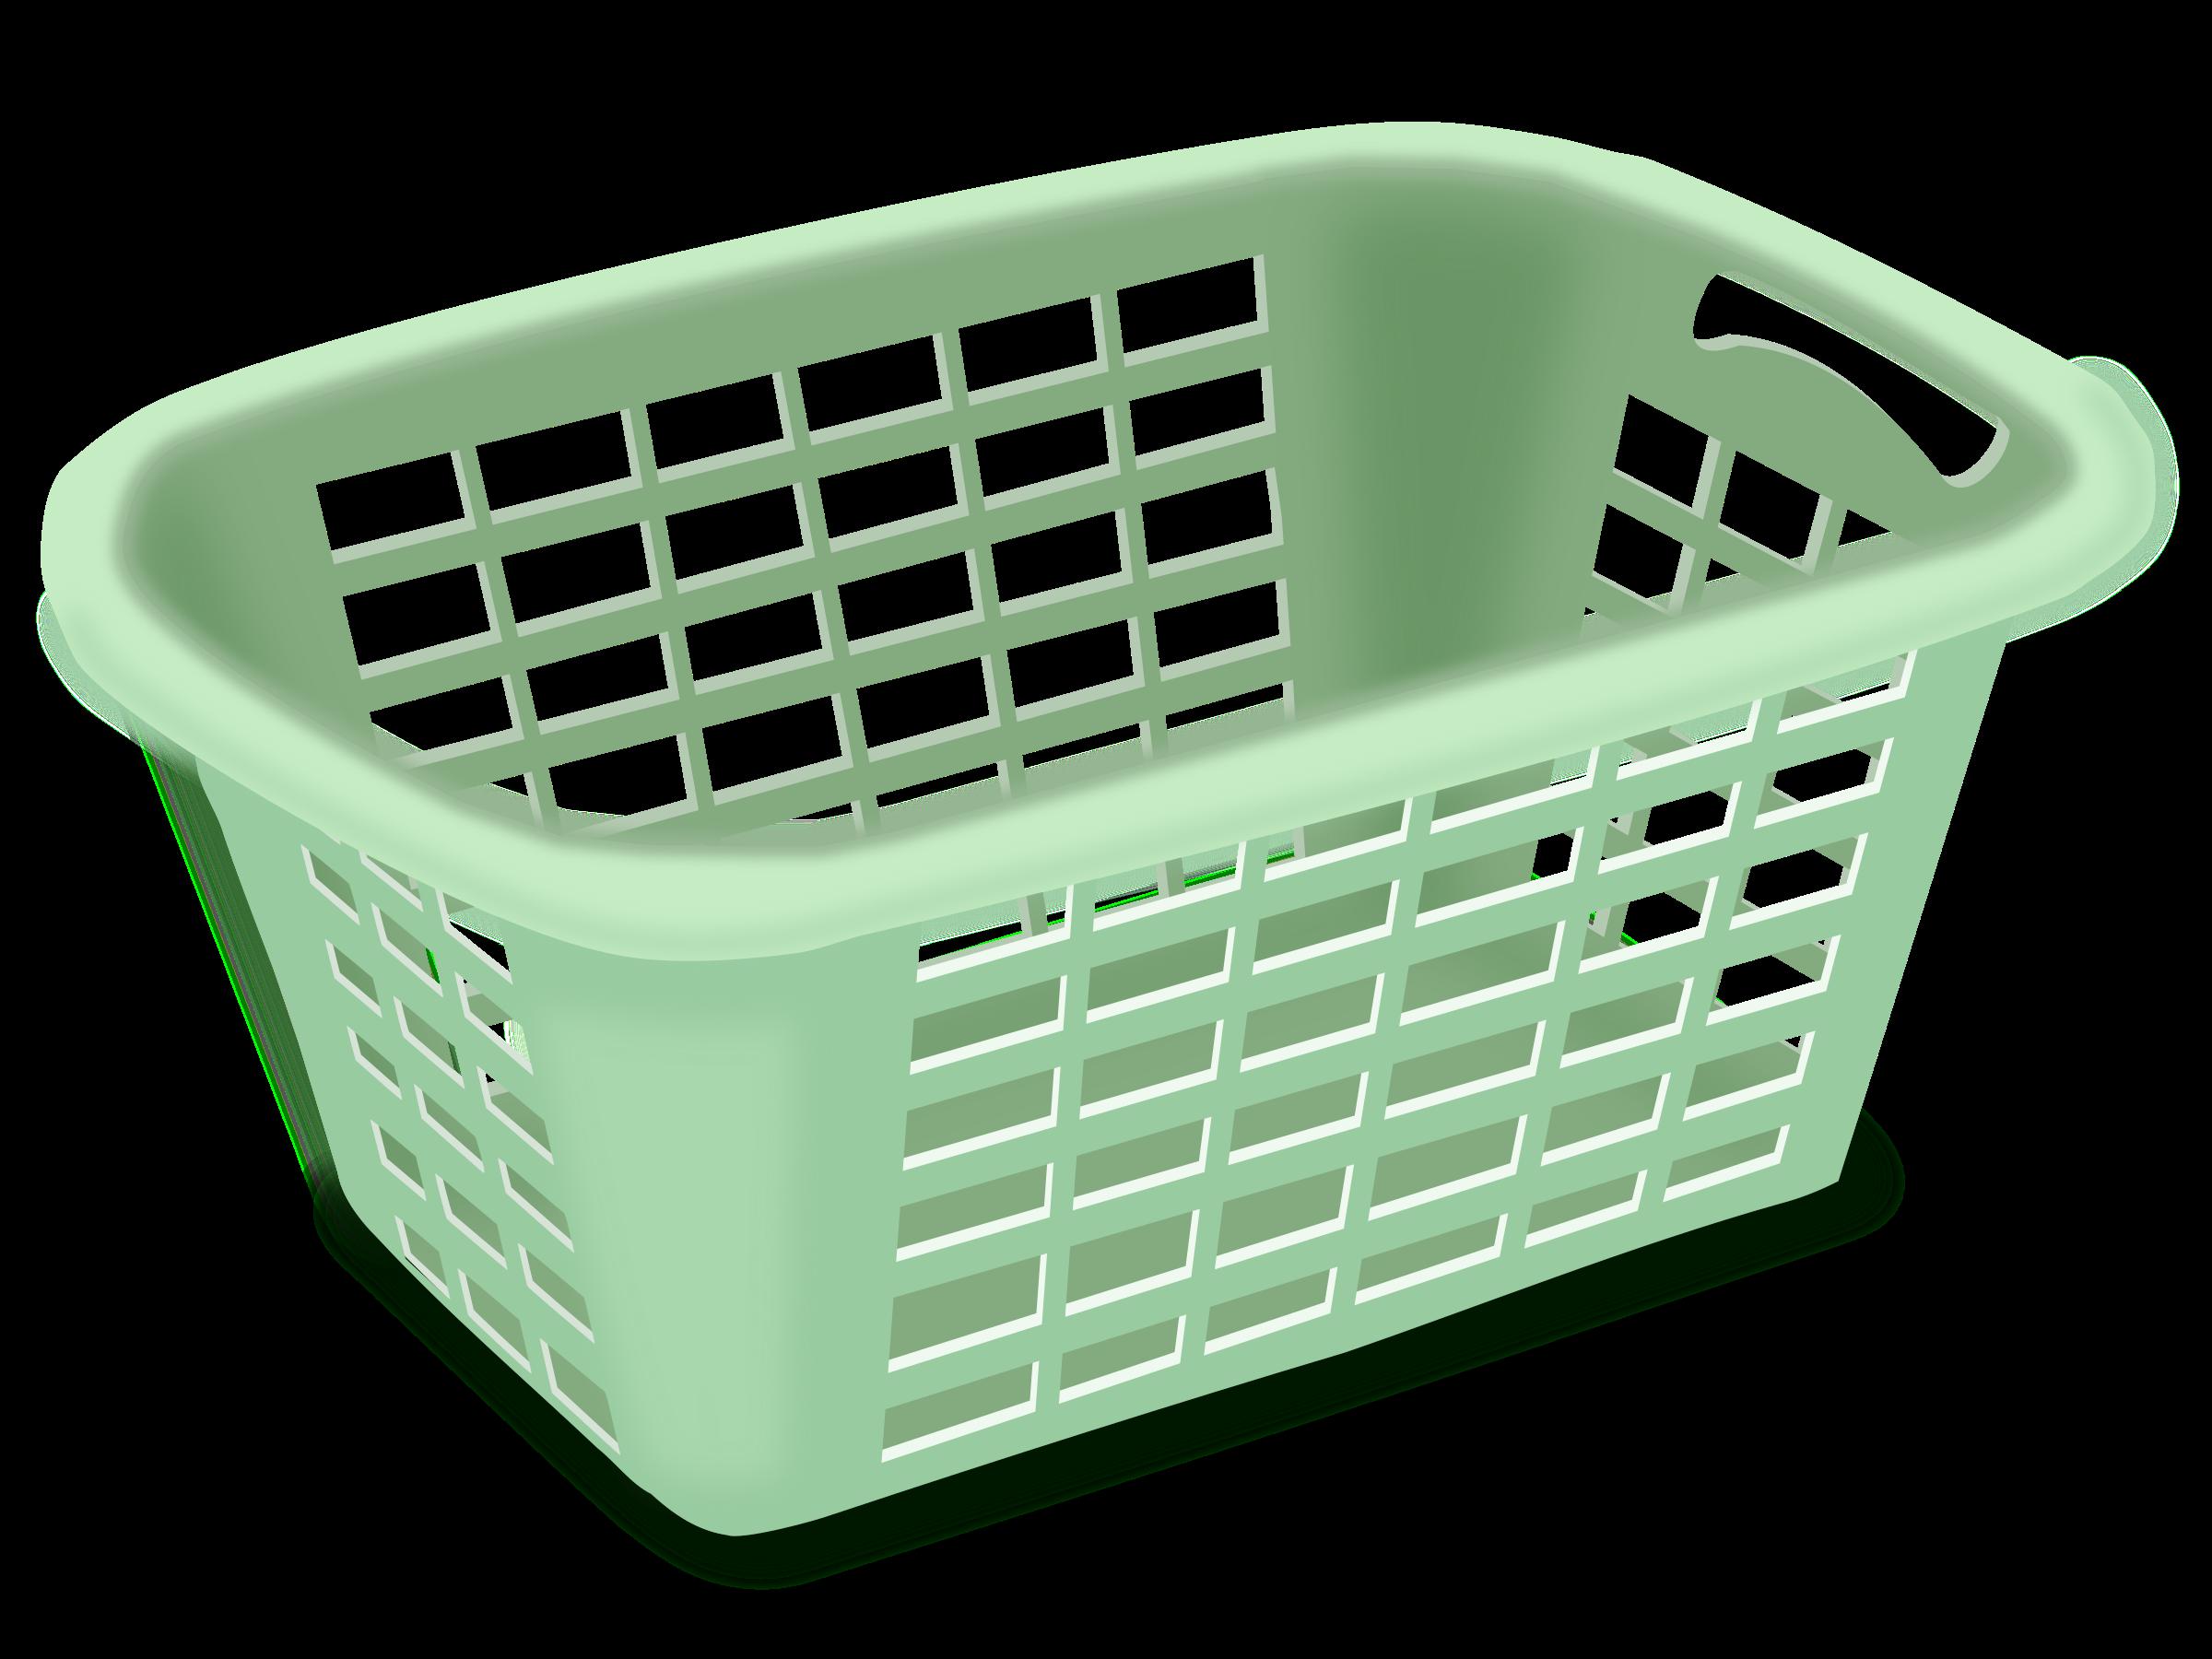 Laundry Basket Clipart & Laundry Basket Clip Art Images.